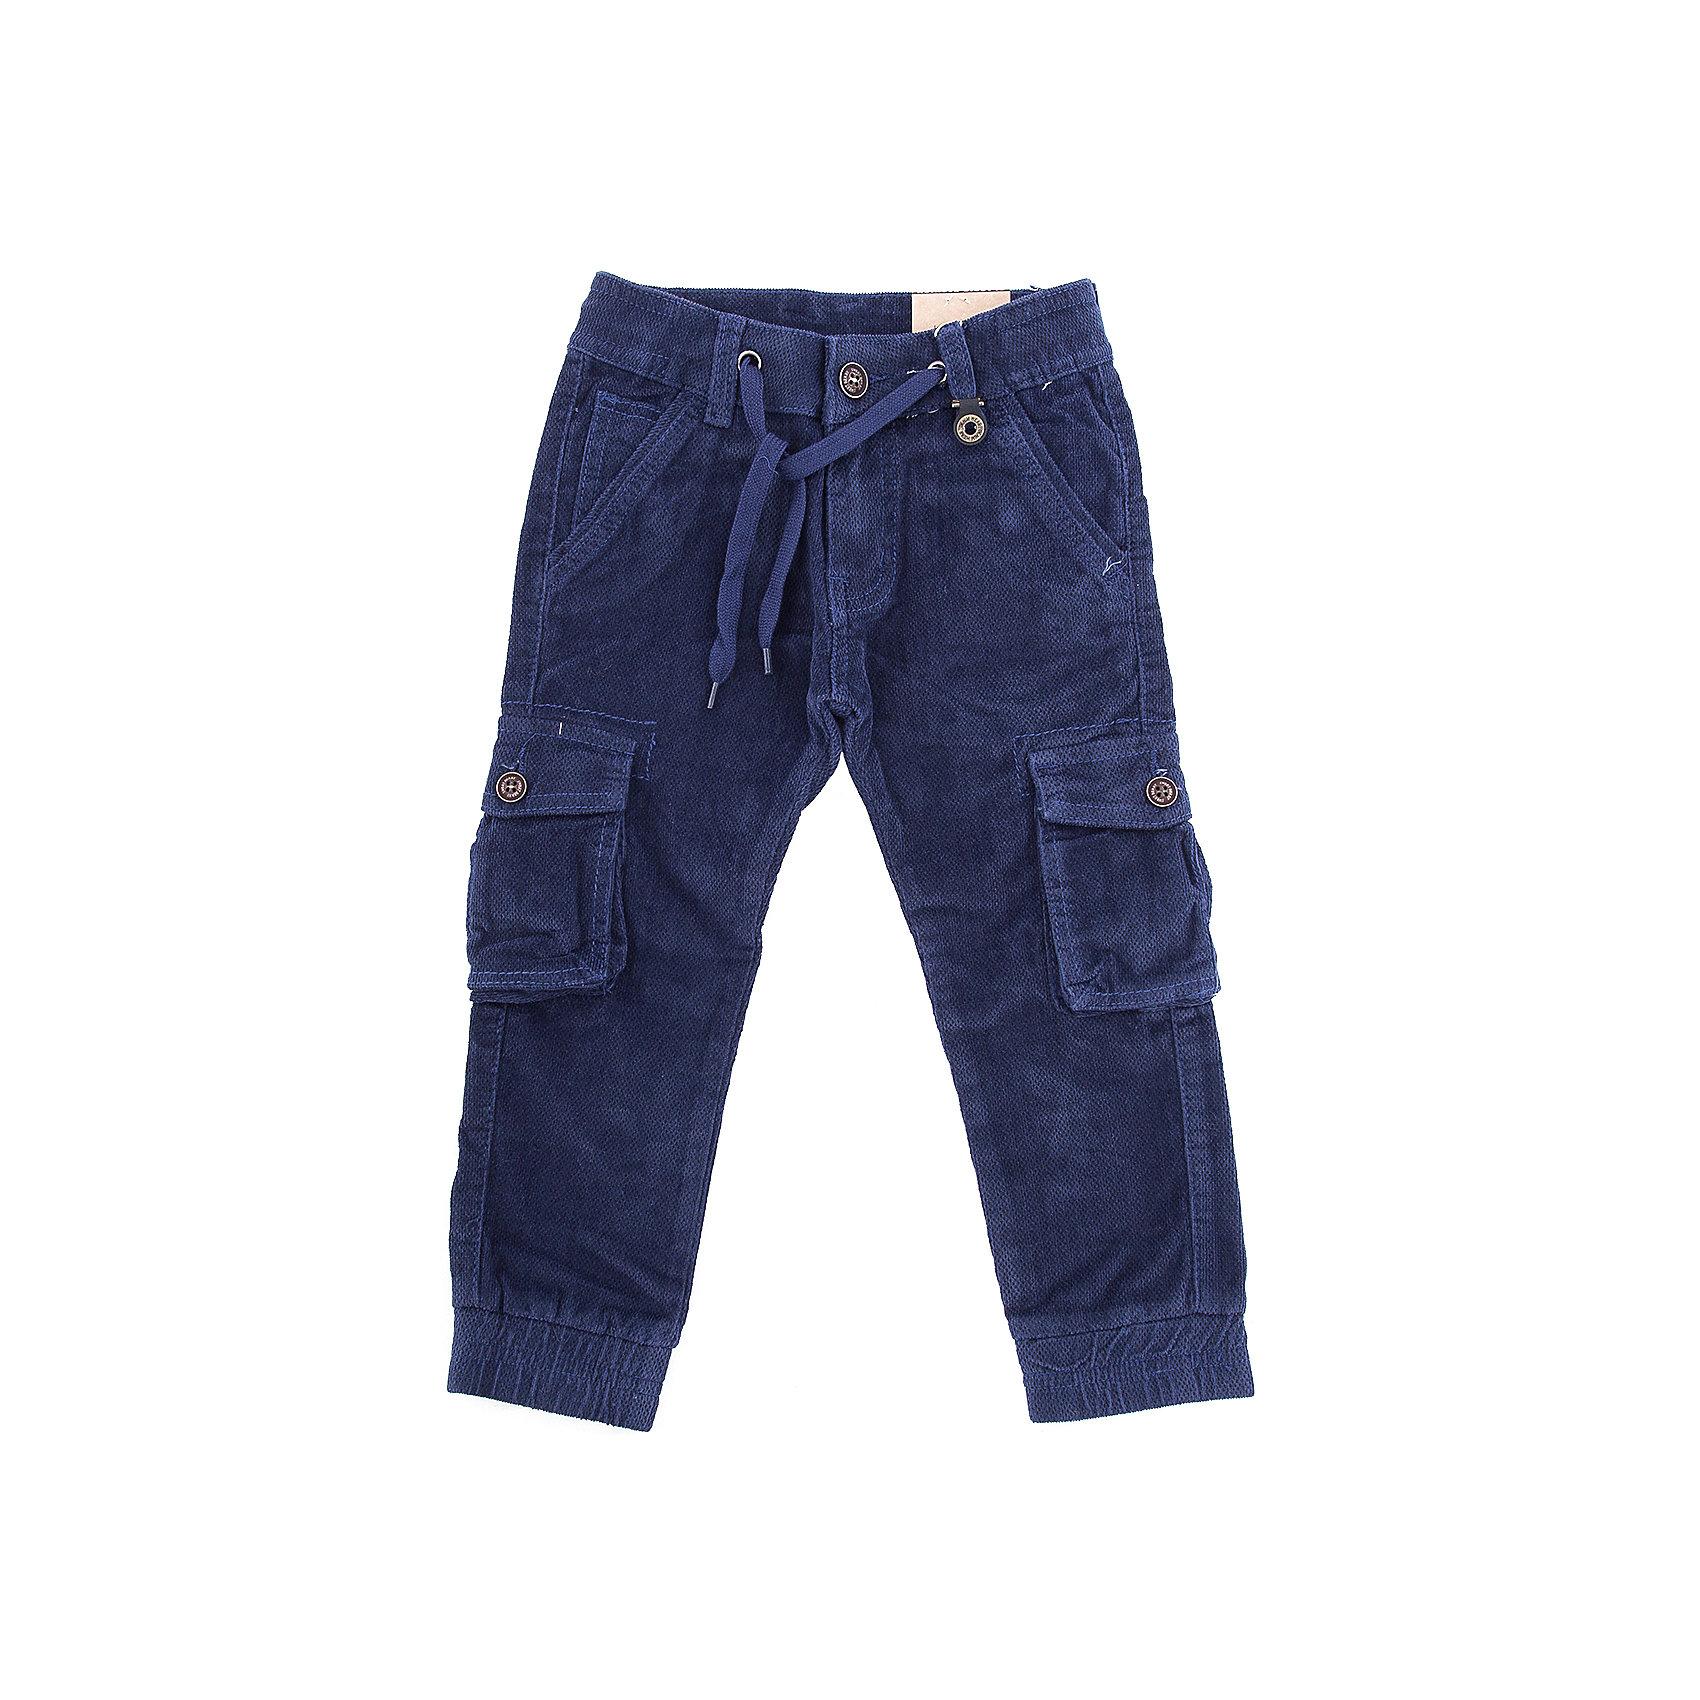 Брюки Sweet Berry для мальчикаБрюки<br>Брюки Sweet Berry для мальчика<br>Модные, вельветовые брюки для мальчика на эластичный пояс со шнуром для регулирования объема по талии. Низ брючин собран на мягкие манжеты. Брюки декорированы двумя накладными карманами.<br>Состав:<br>98% хлопок, 2% спандекс<br><br>Ширина мм: 215<br>Глубина мм: 88<br>Высота мм: 191<br>Вес г: 336<br>Цвет: синий<br>Возраст от месяцев: 84<br>Возраст до месяцев: 96<br>Пол: Мужской<br>Возраст: Детский<br>Размер: 128,98,104,110,116,122<br>SKU: 7094706